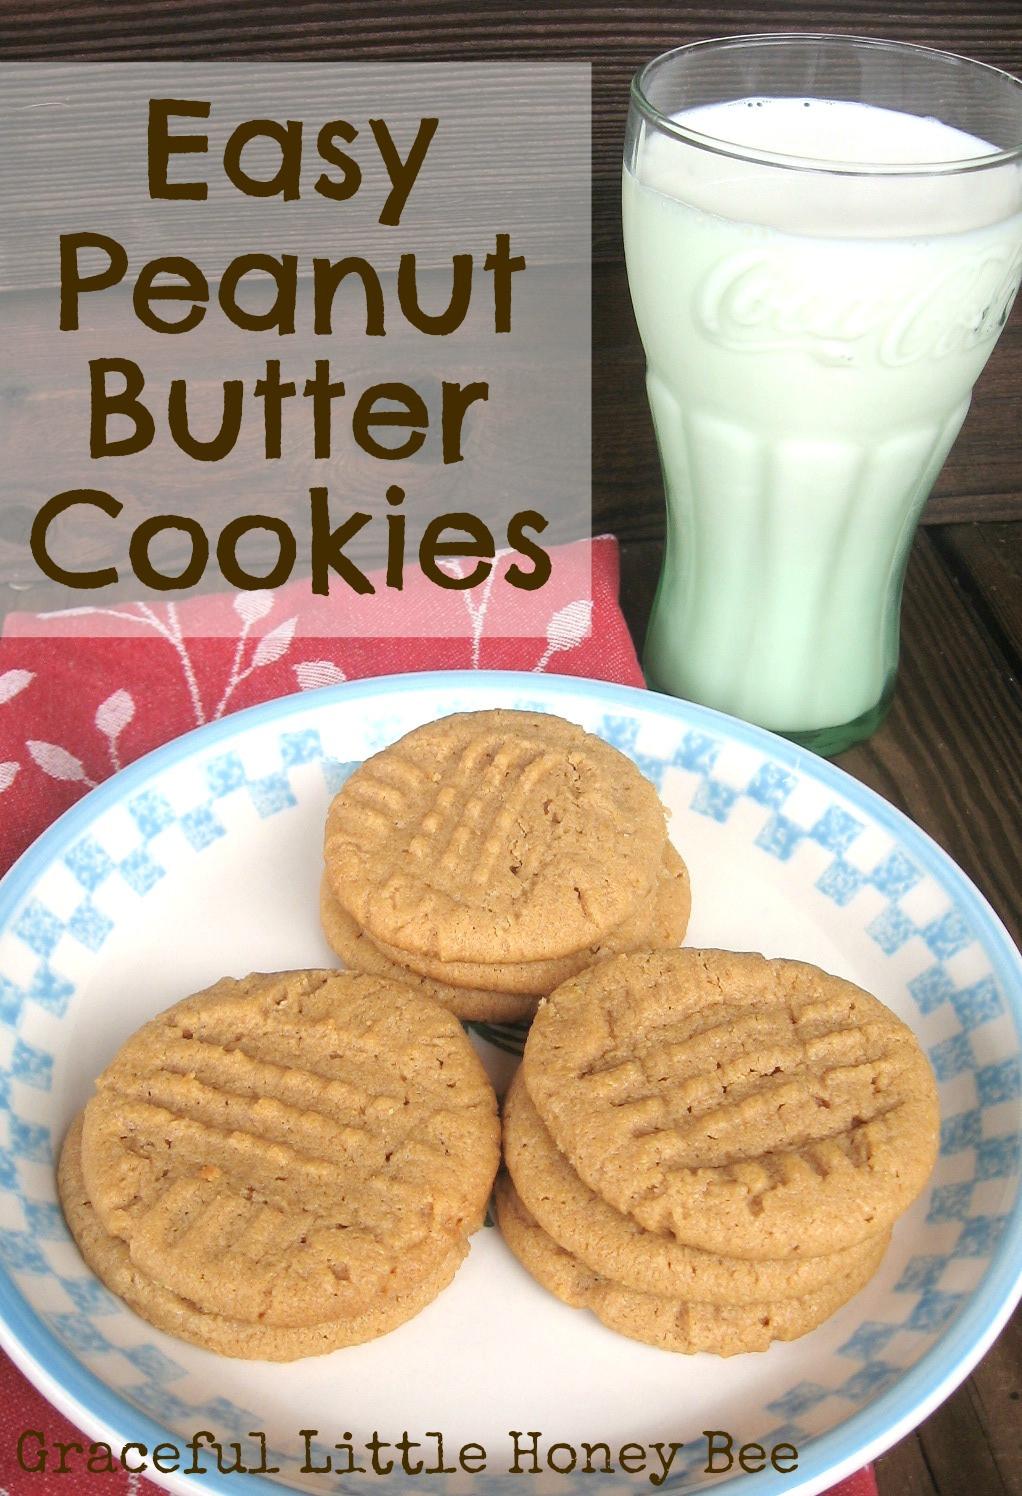 Easy Peanut Butter Cookies  Easy Peanut Butter Cookies Graceful Little Honey Bee